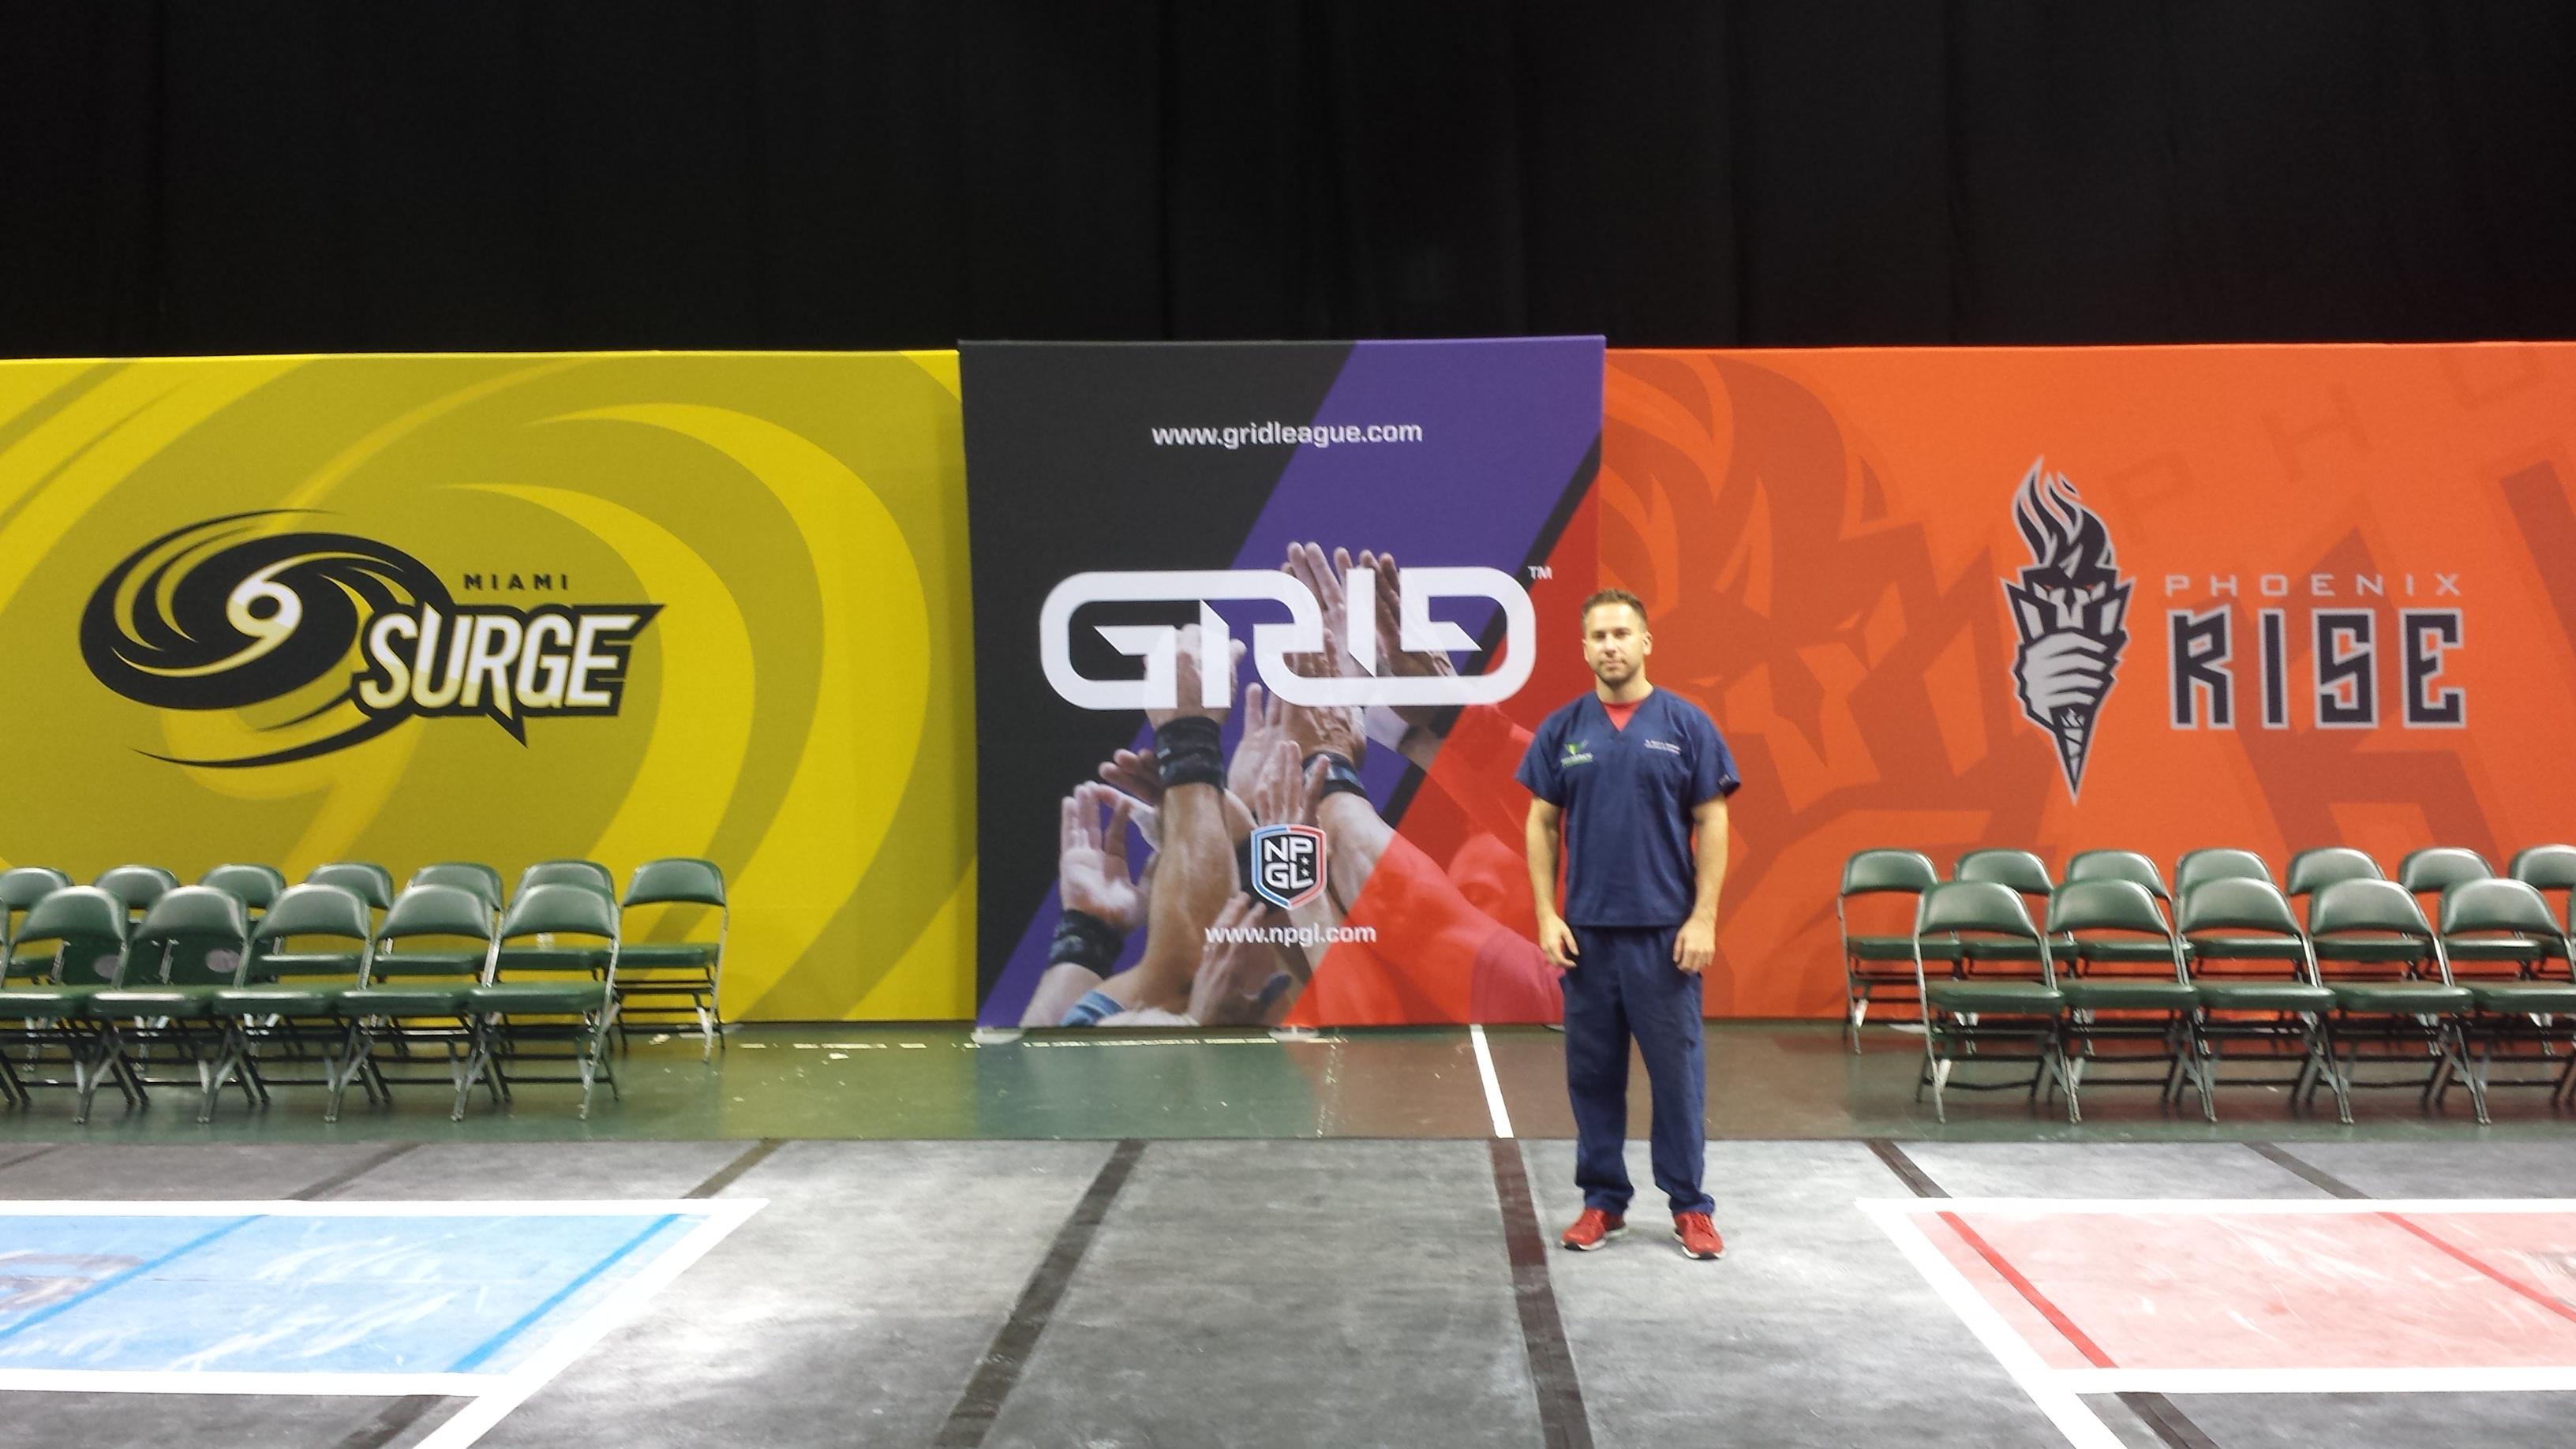 Miami Surge vs. Phoenix Rise GRID League Match at BankUnited Center.